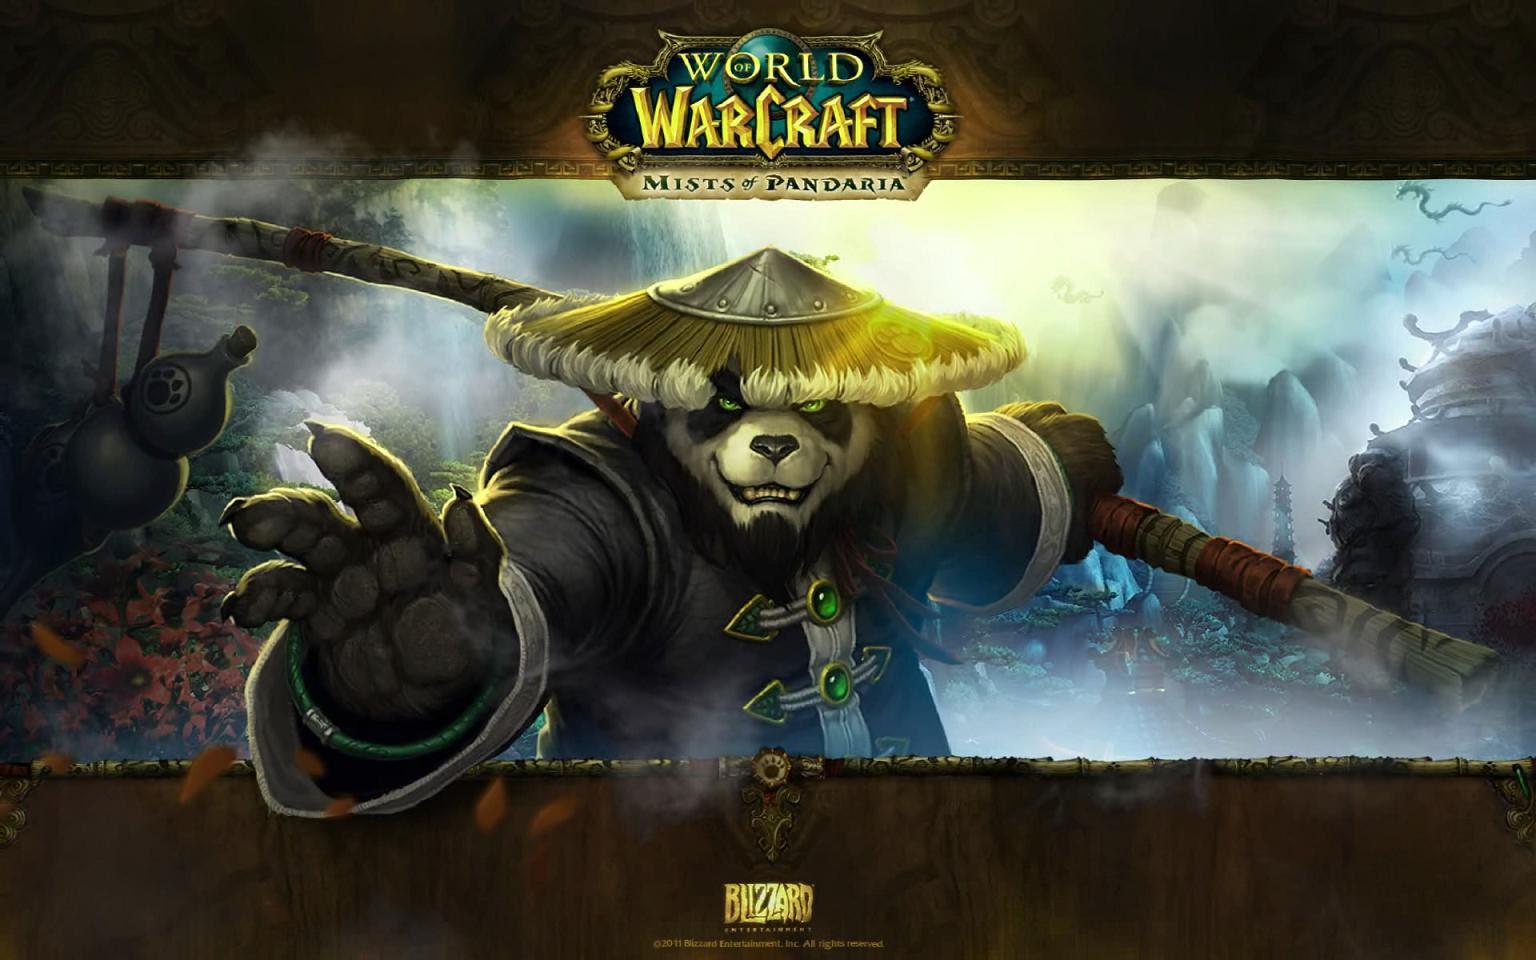 Mists Of Pandaria Animated Wallpaper Full Windows 7 Screenshot